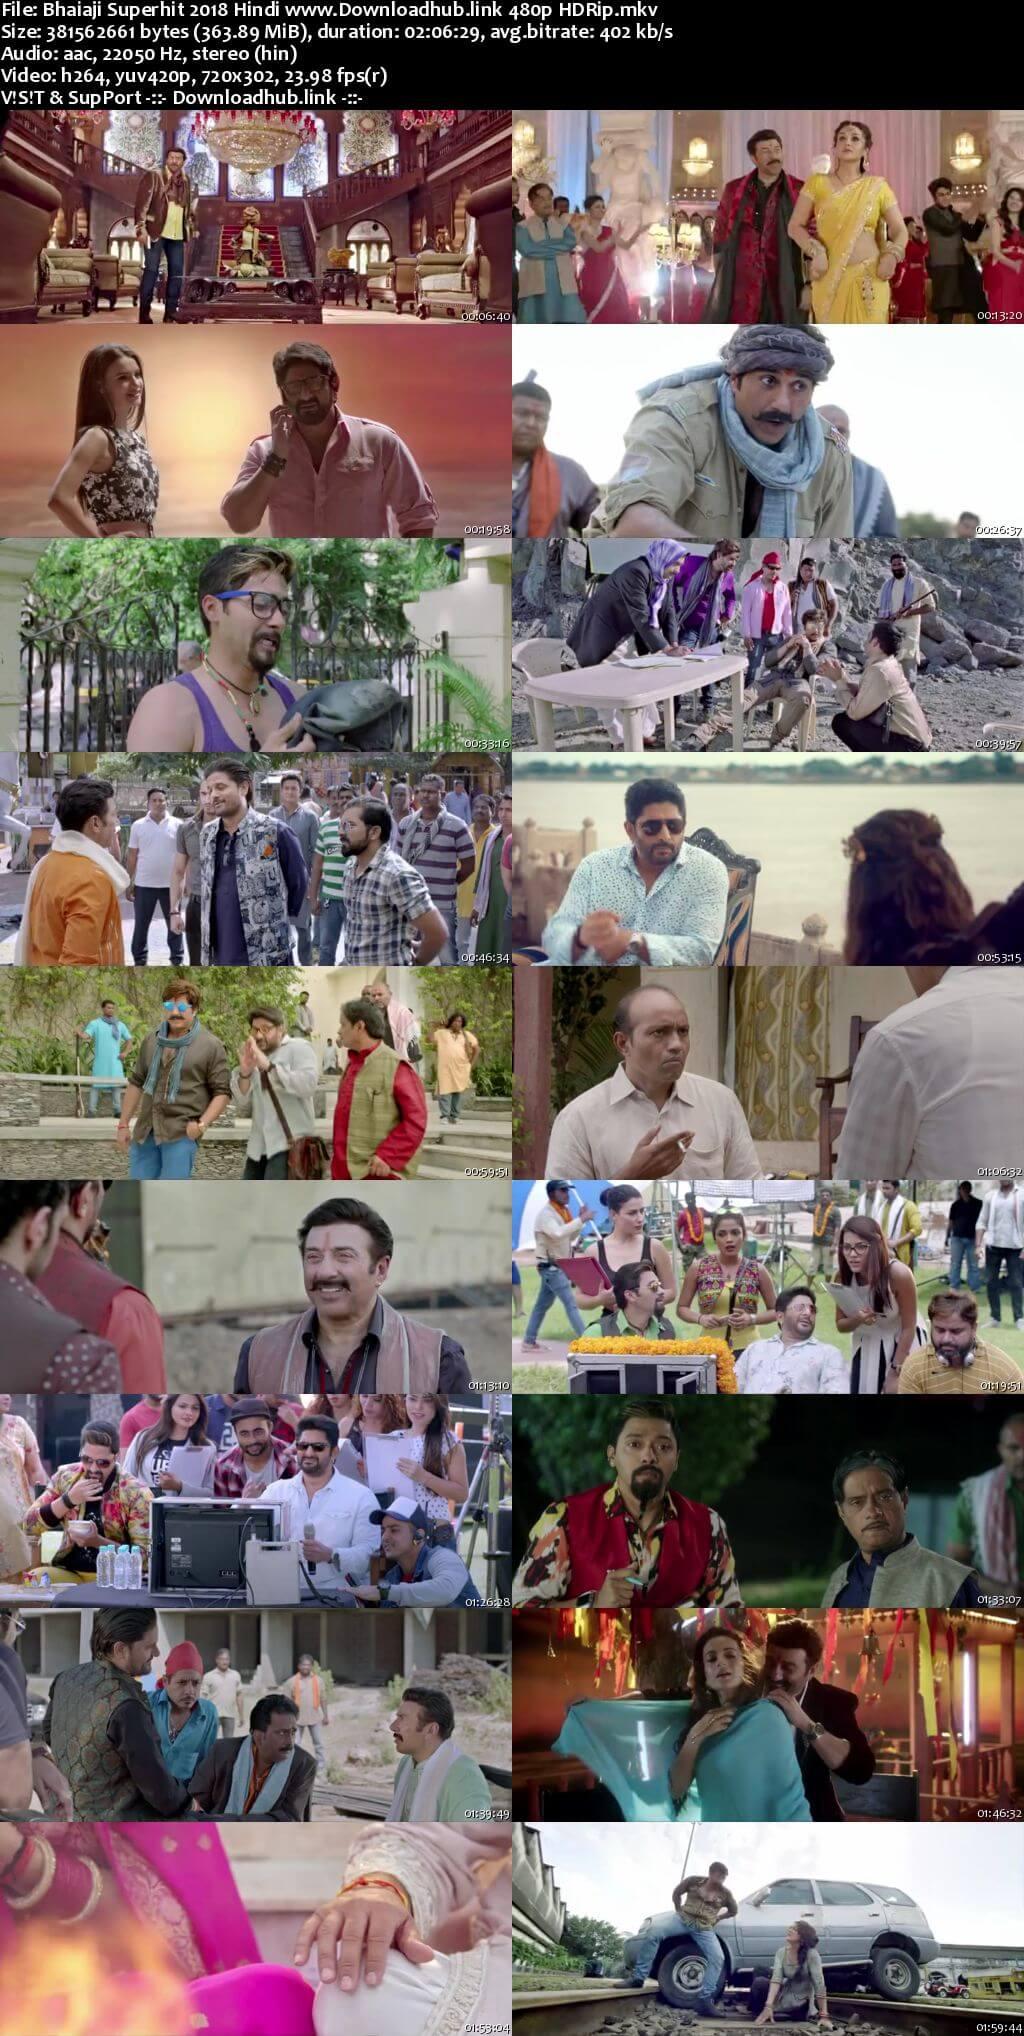 Bhaiaji Superhit 2018 Hindi 350MB HDRip 480p